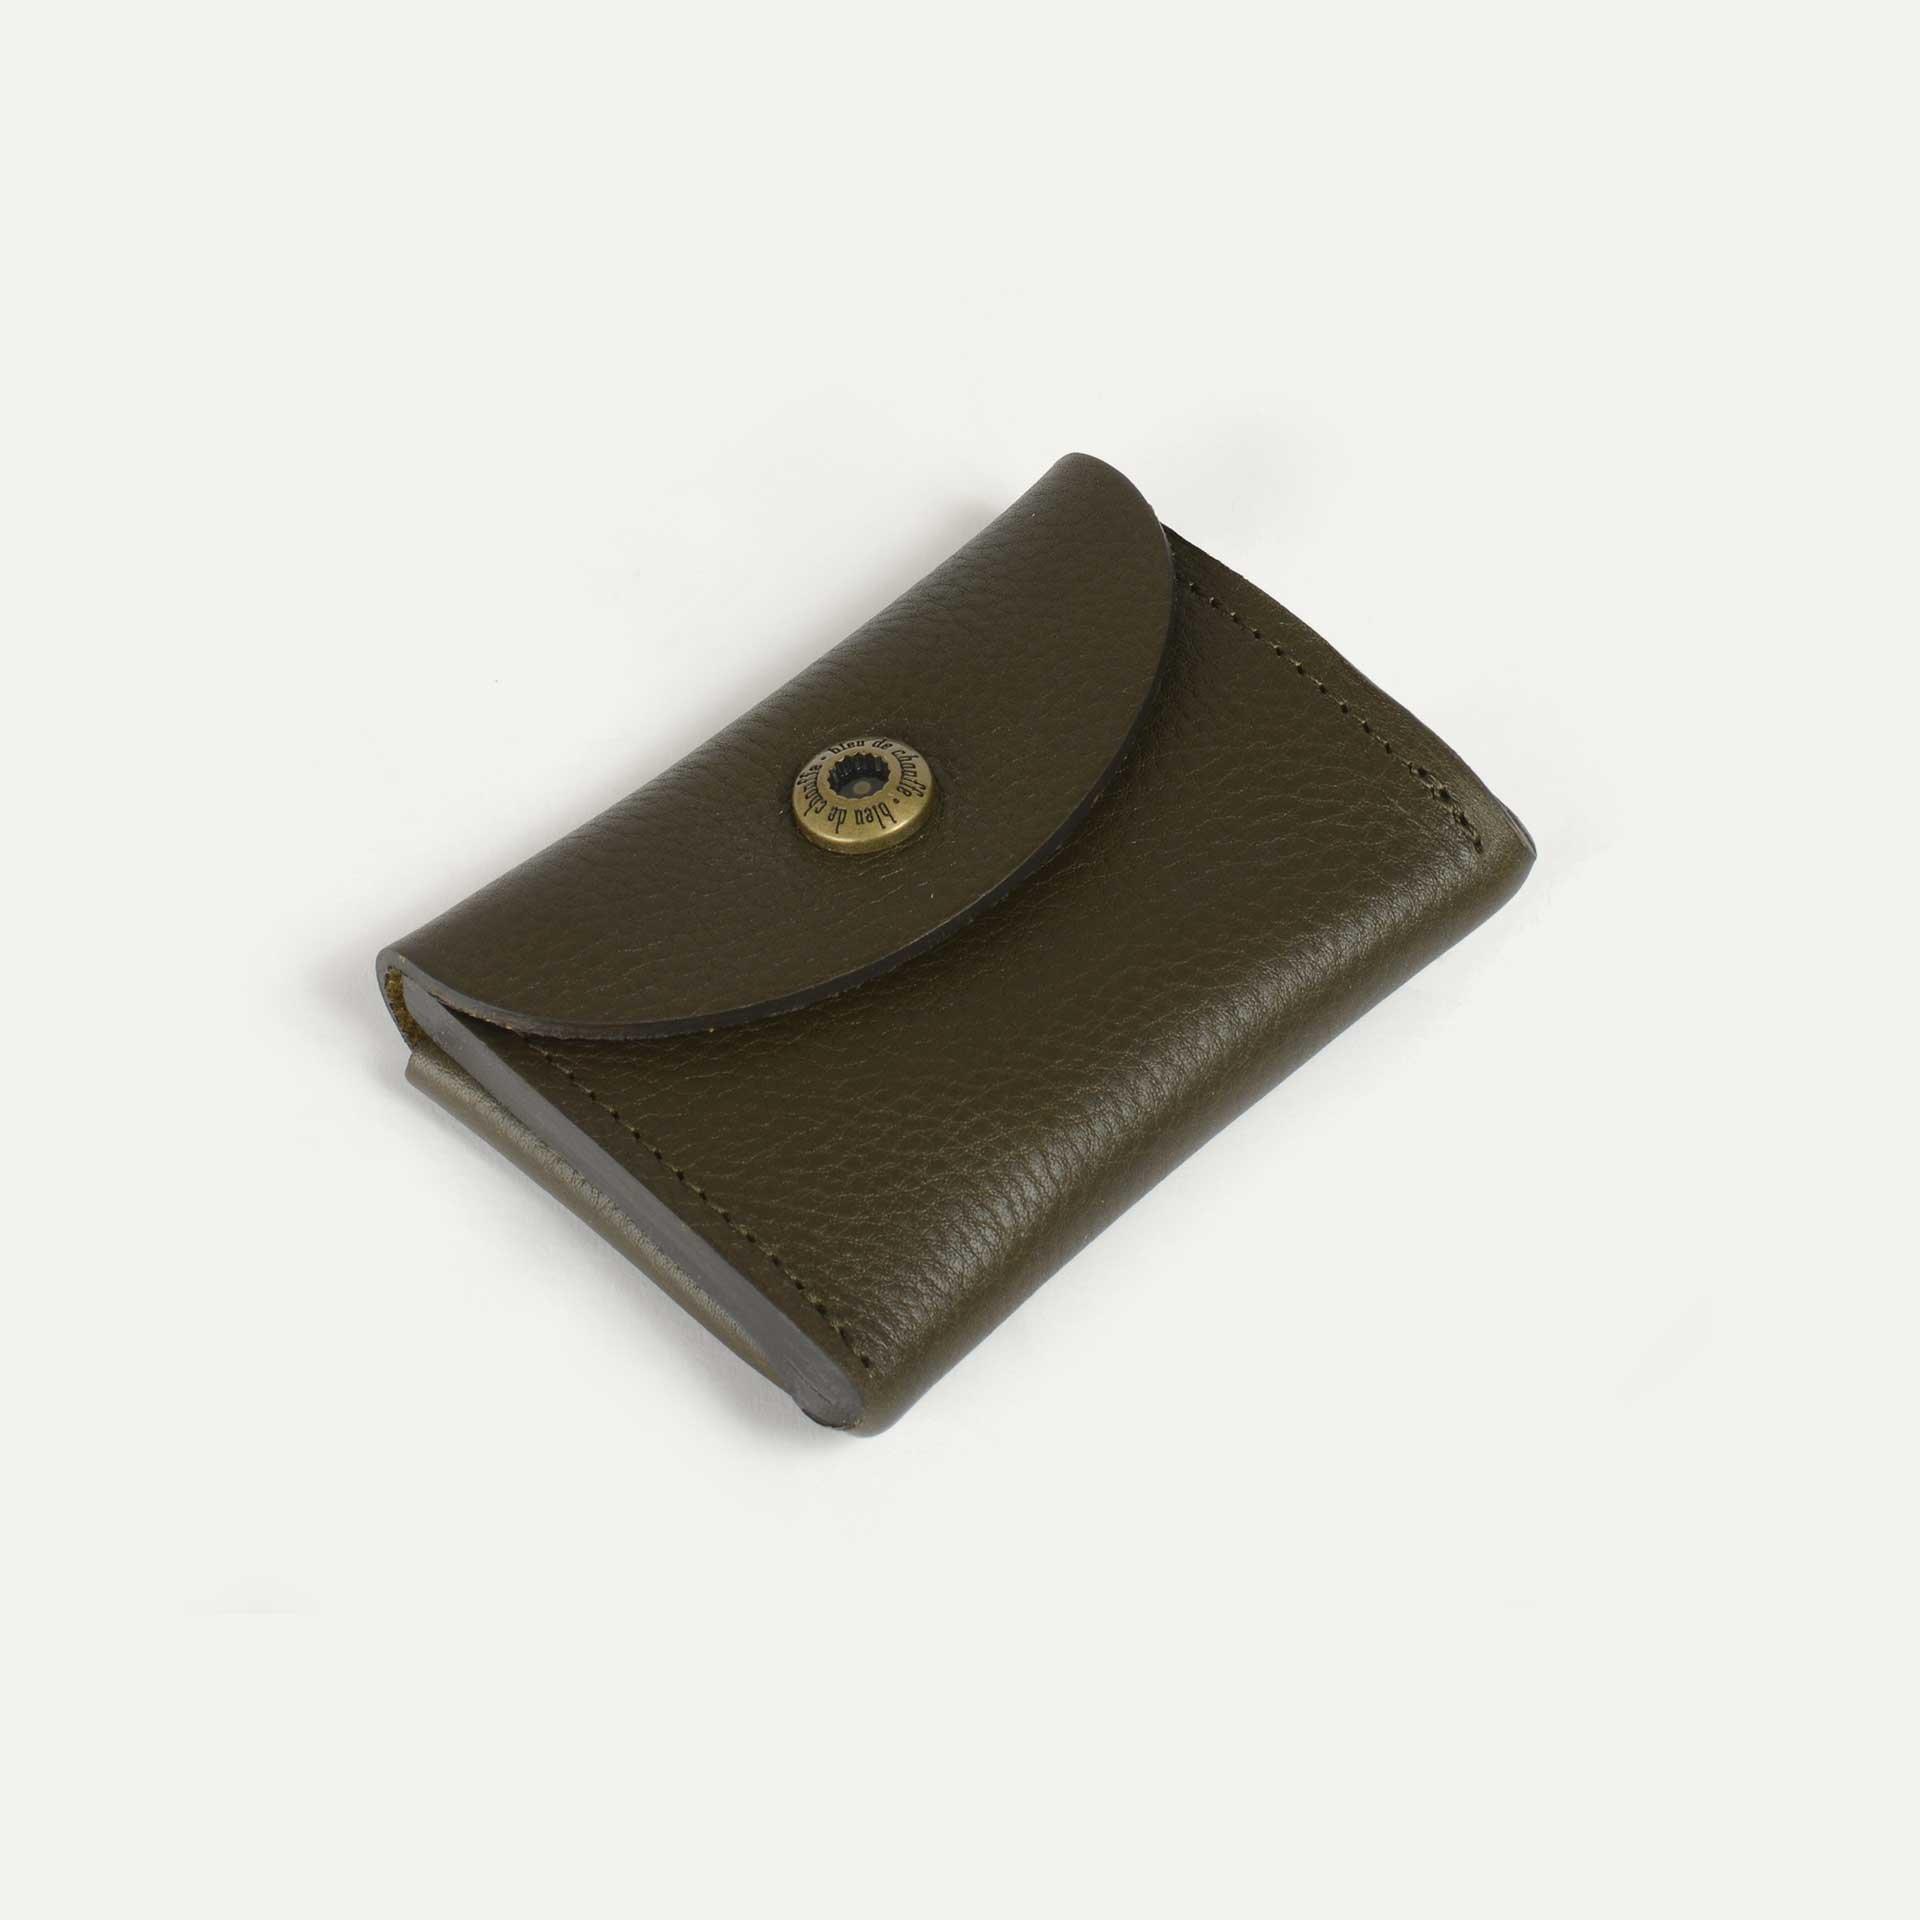 Talbin Shoemaker purse - Khaki (image n°2)